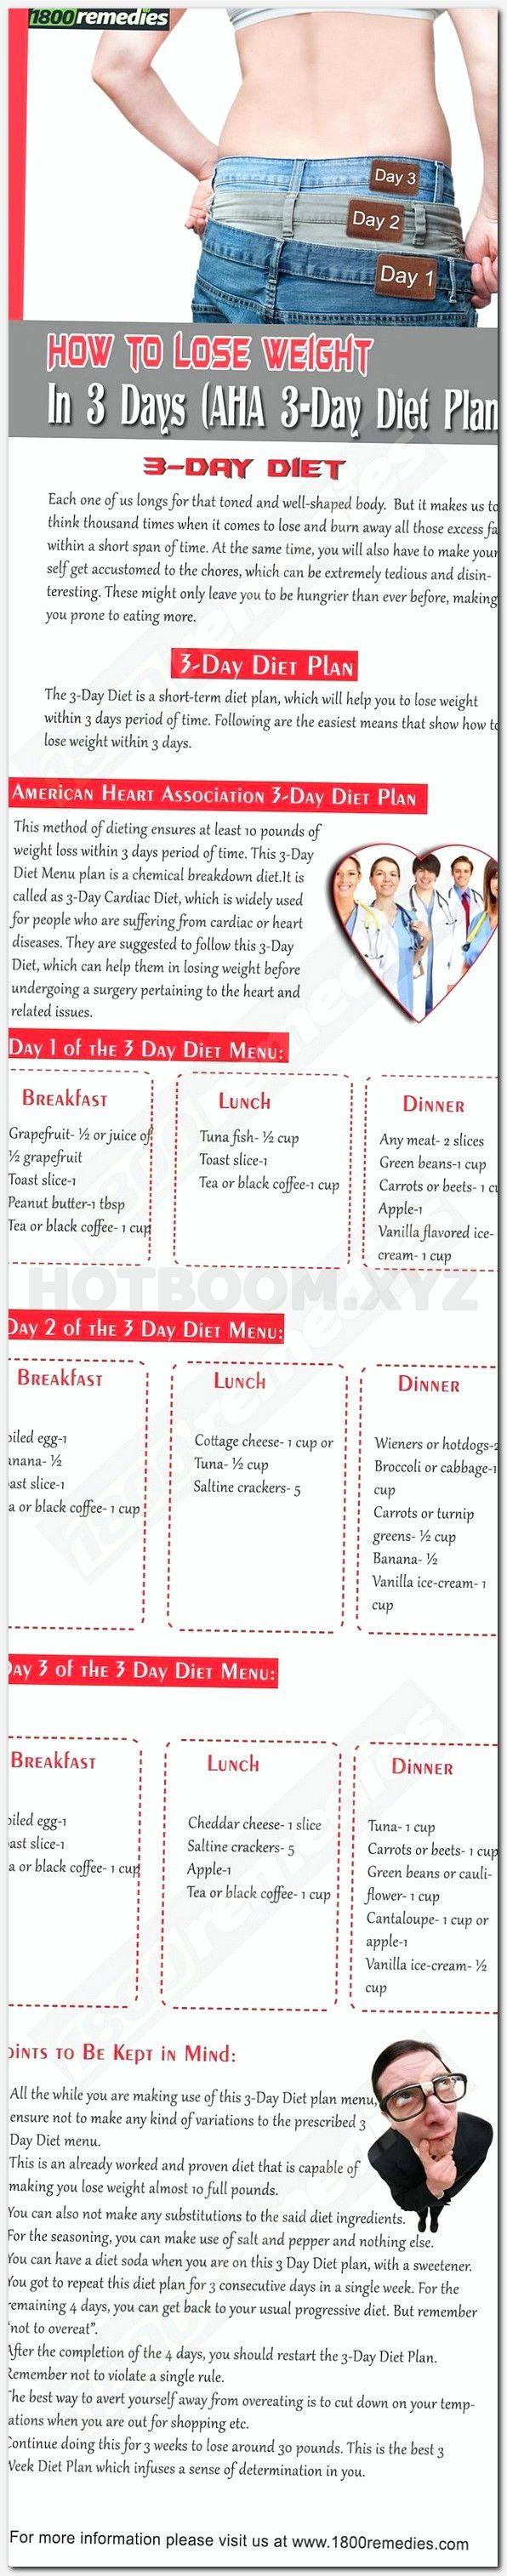 Full liquid diet list height and weight chart for men diet with full liquid diet list height and weight chart for men diet with soup nvjuhfo Gallery